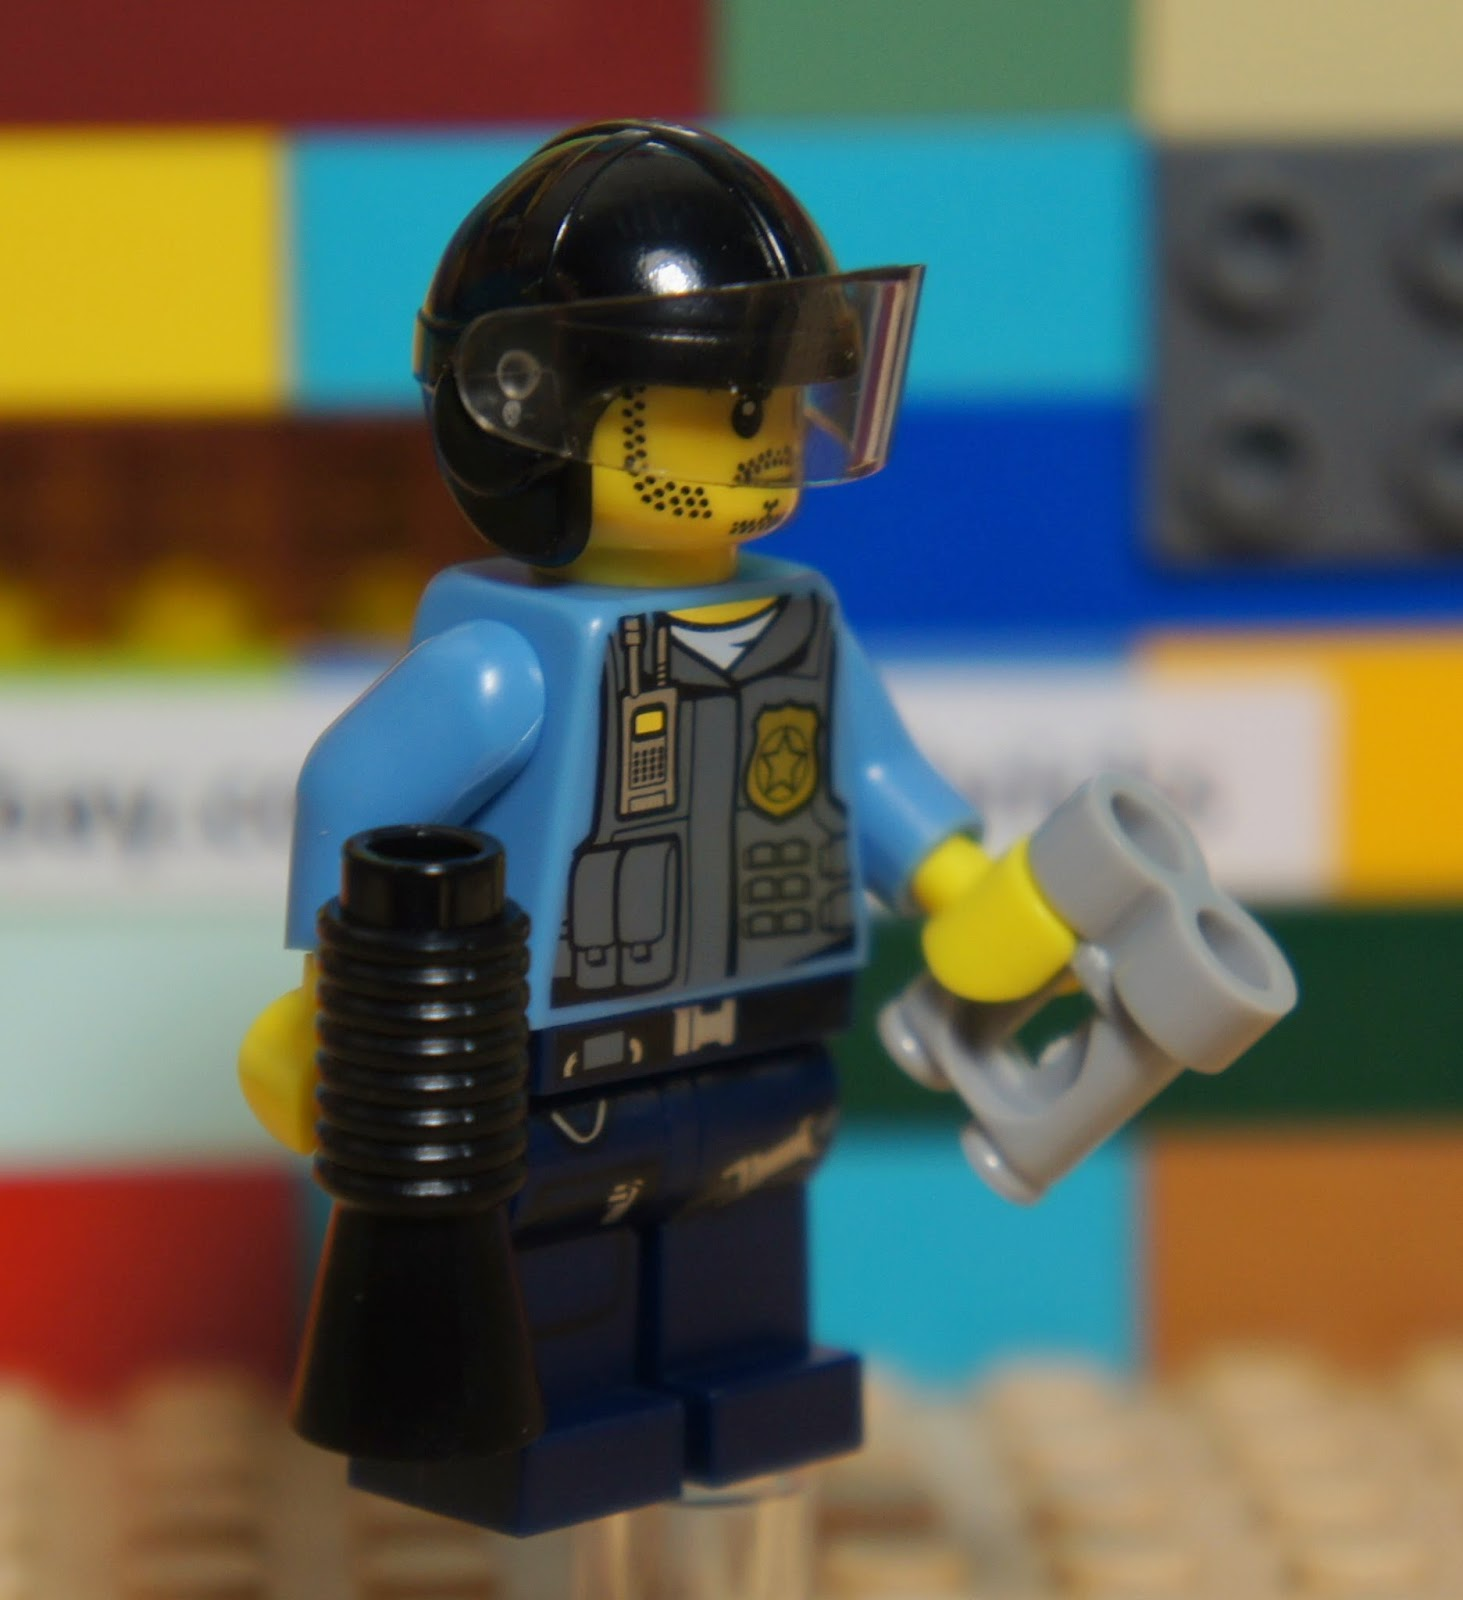 LEGO City POLICEMAN OFFICER #4 Minifigure + Helmet ...